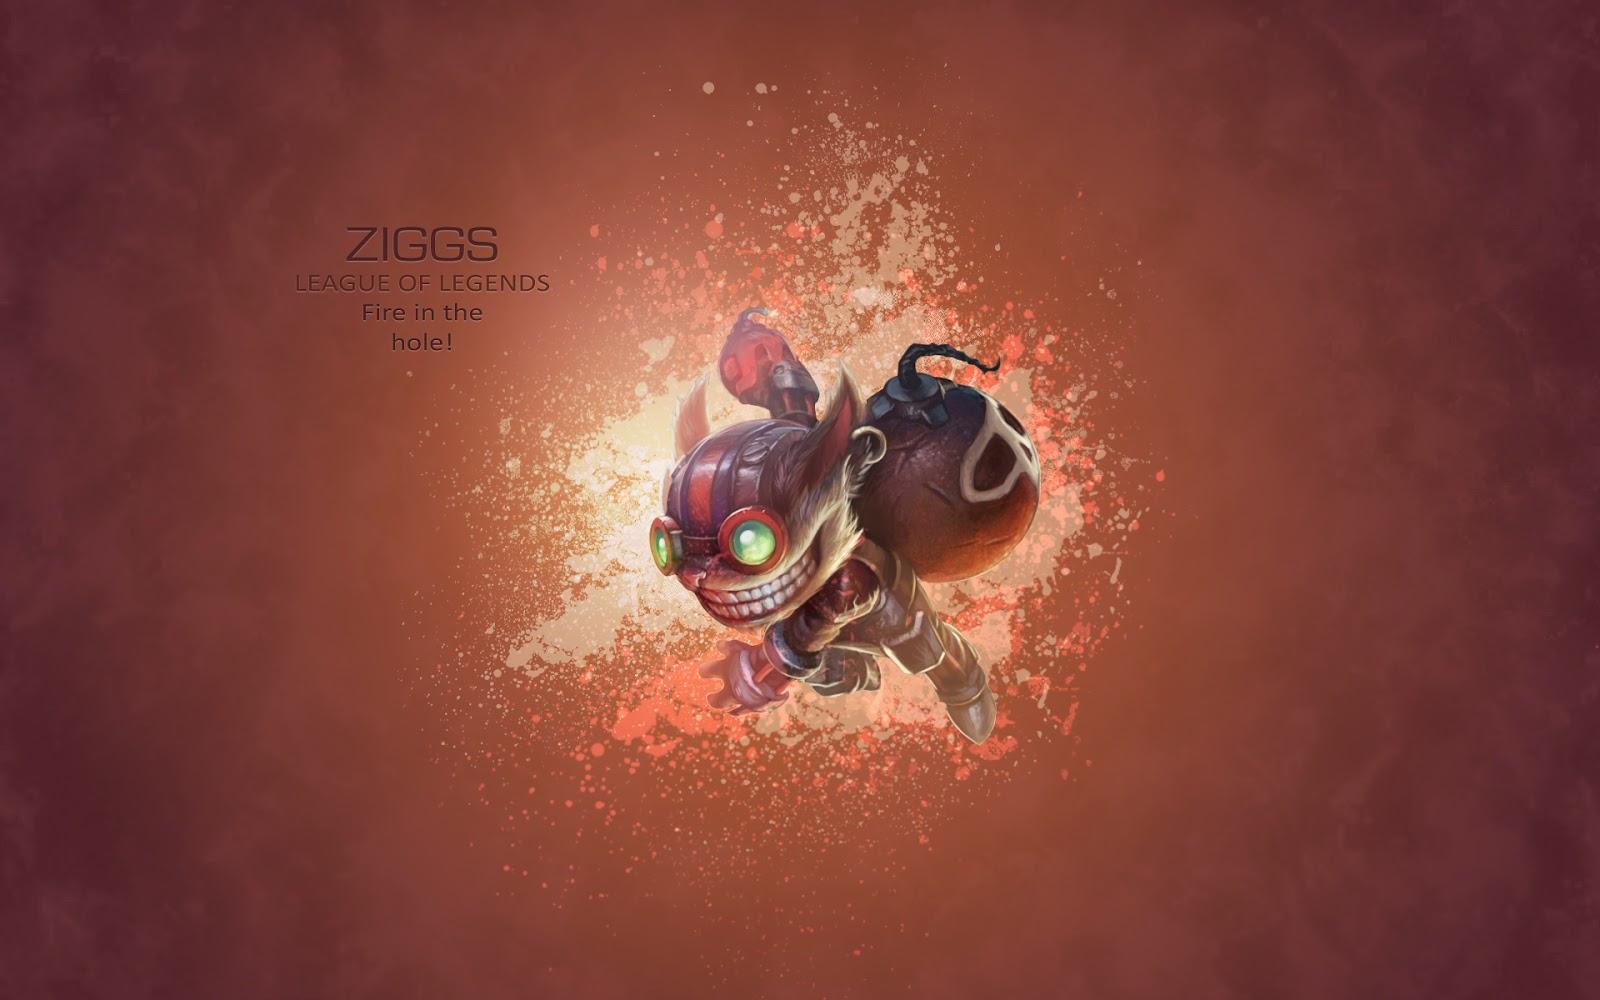 Free Download Odyssey Ziggs Hd Wallpaper Background Image